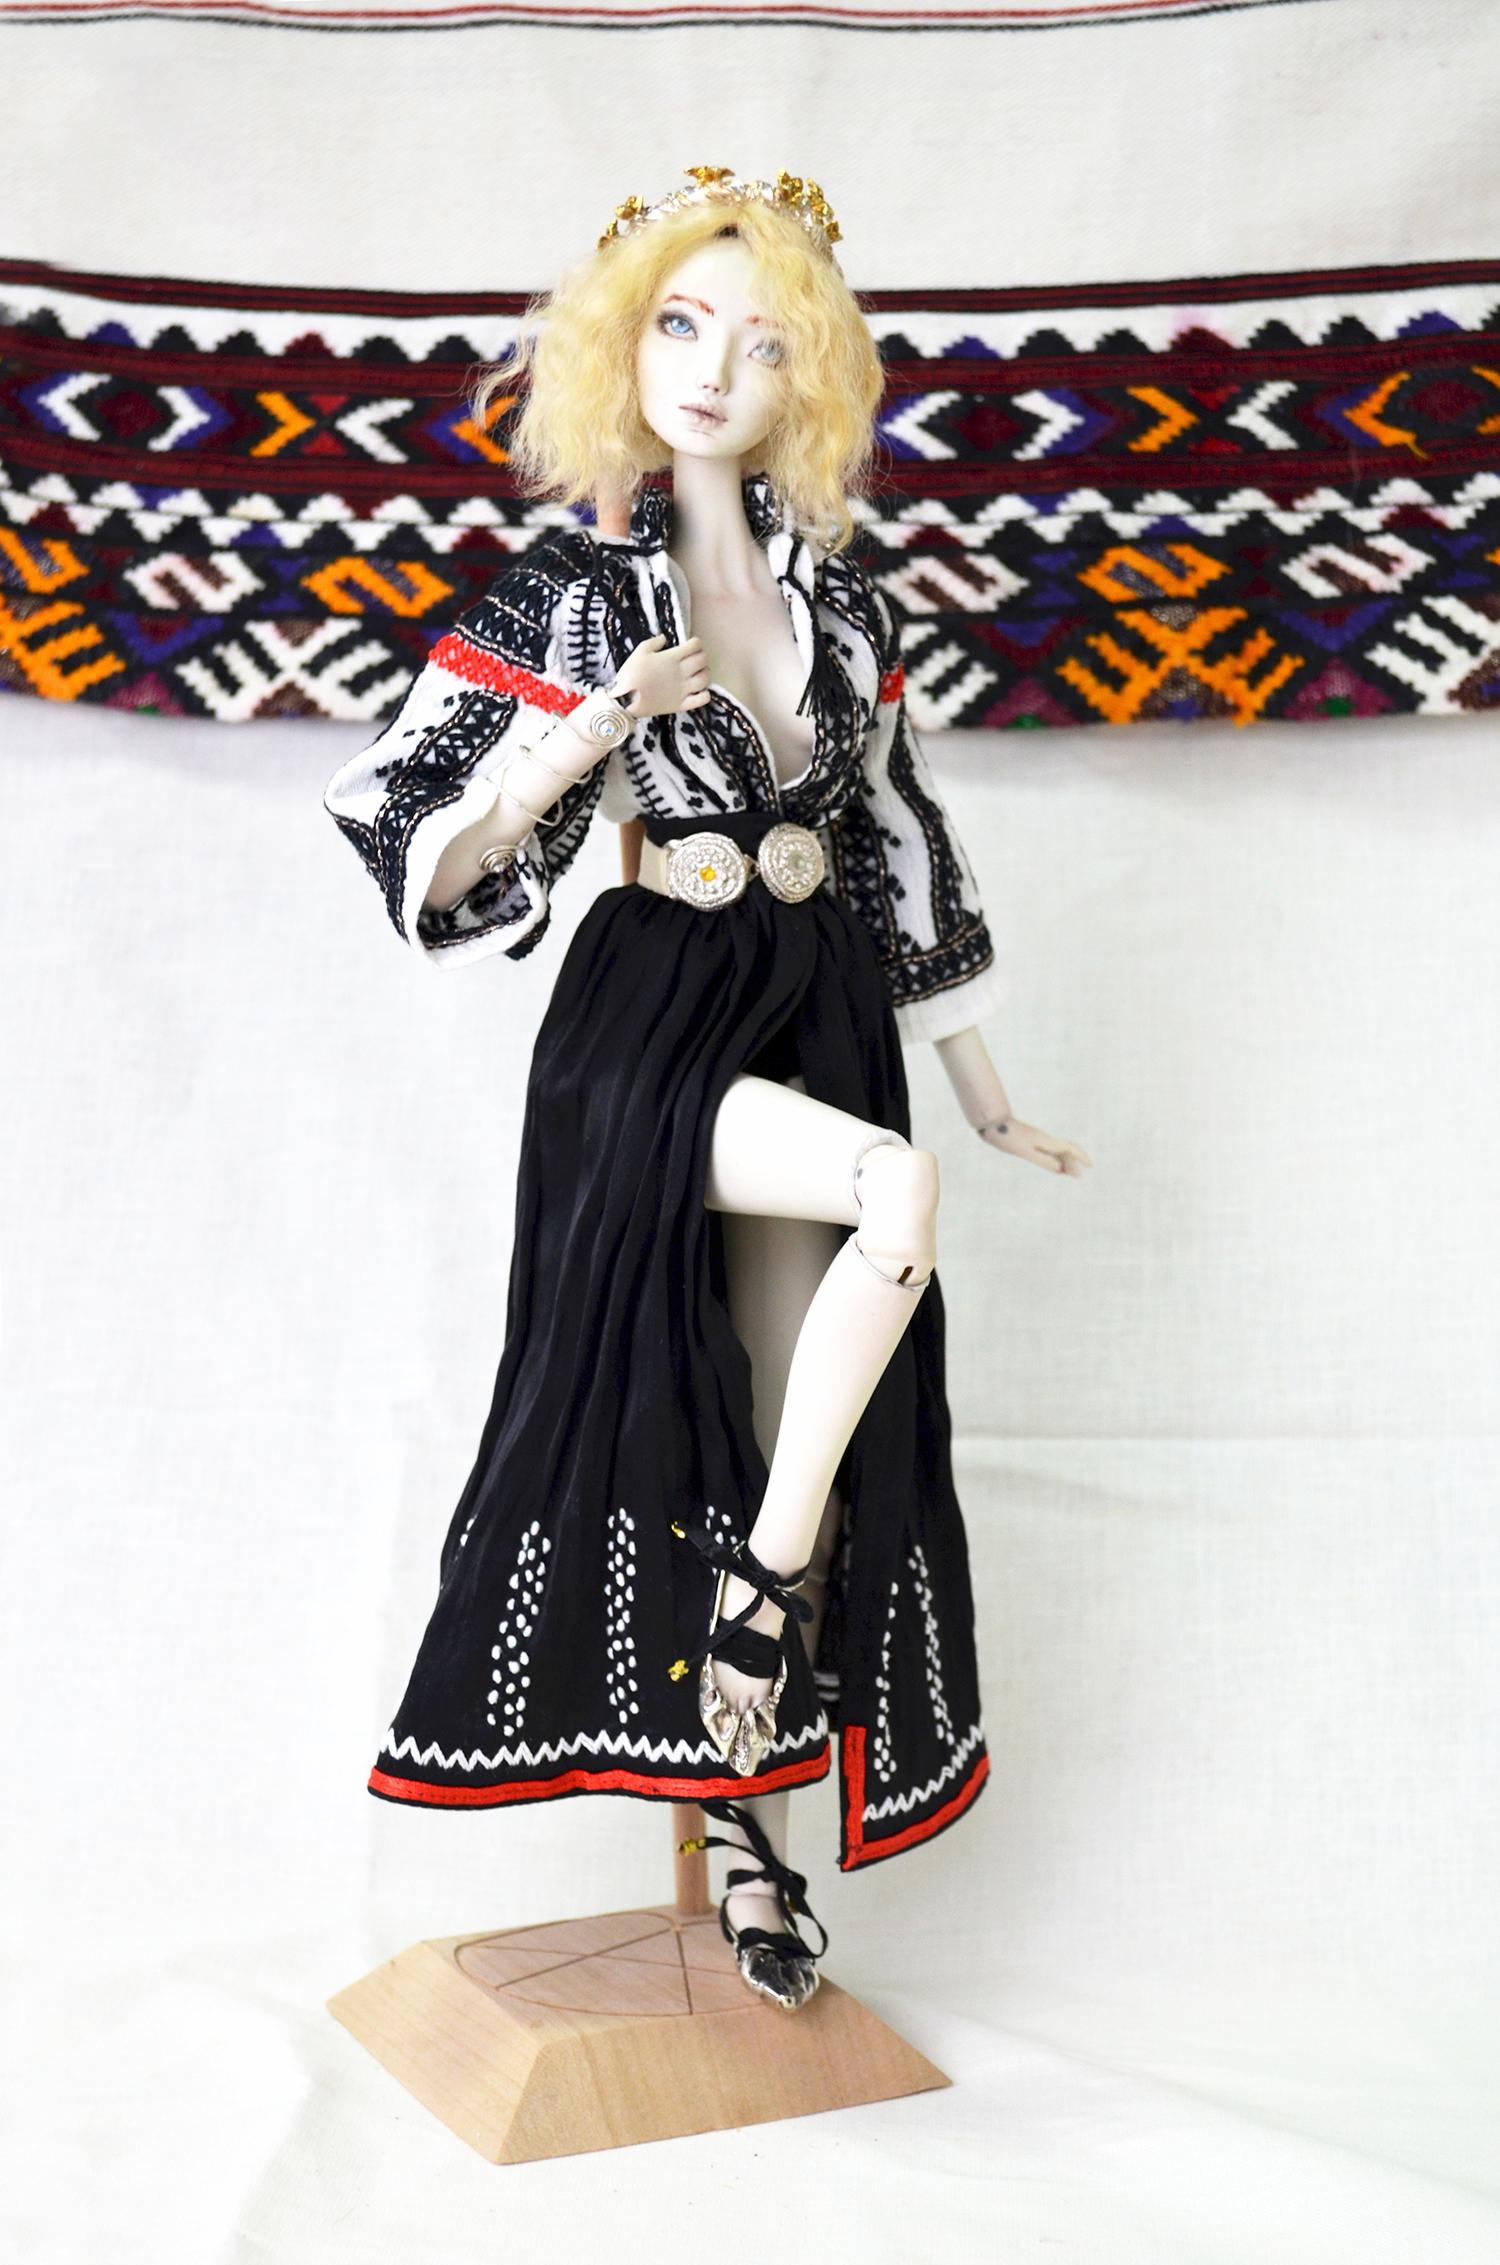 iulia-gorneanu-porcelain-doll-bjd